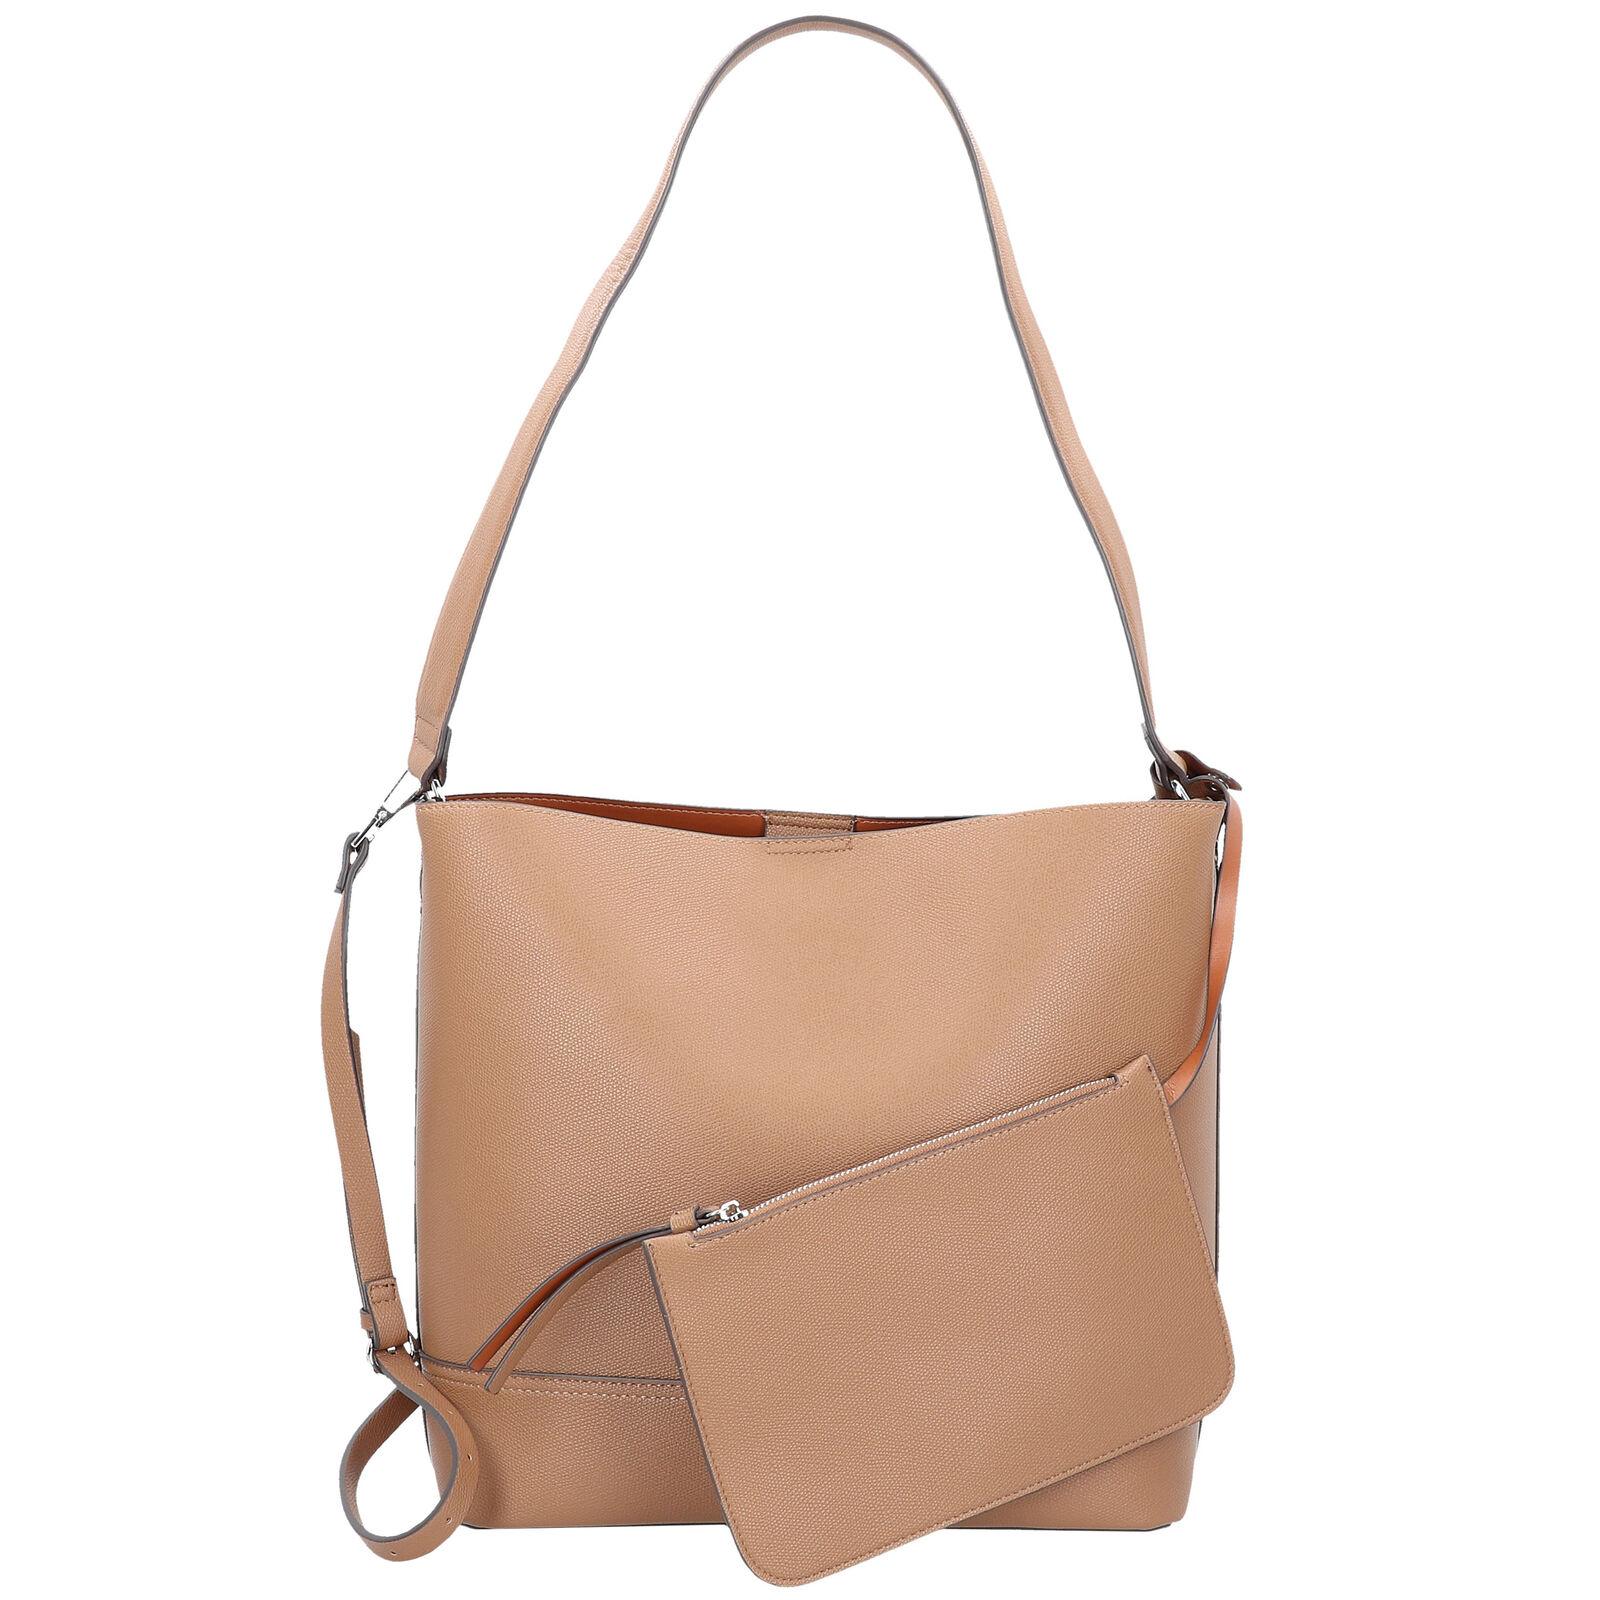 Esprit Kerry Handtasche 32 Shopper Damen Cm Schultertasche nOkwPX80